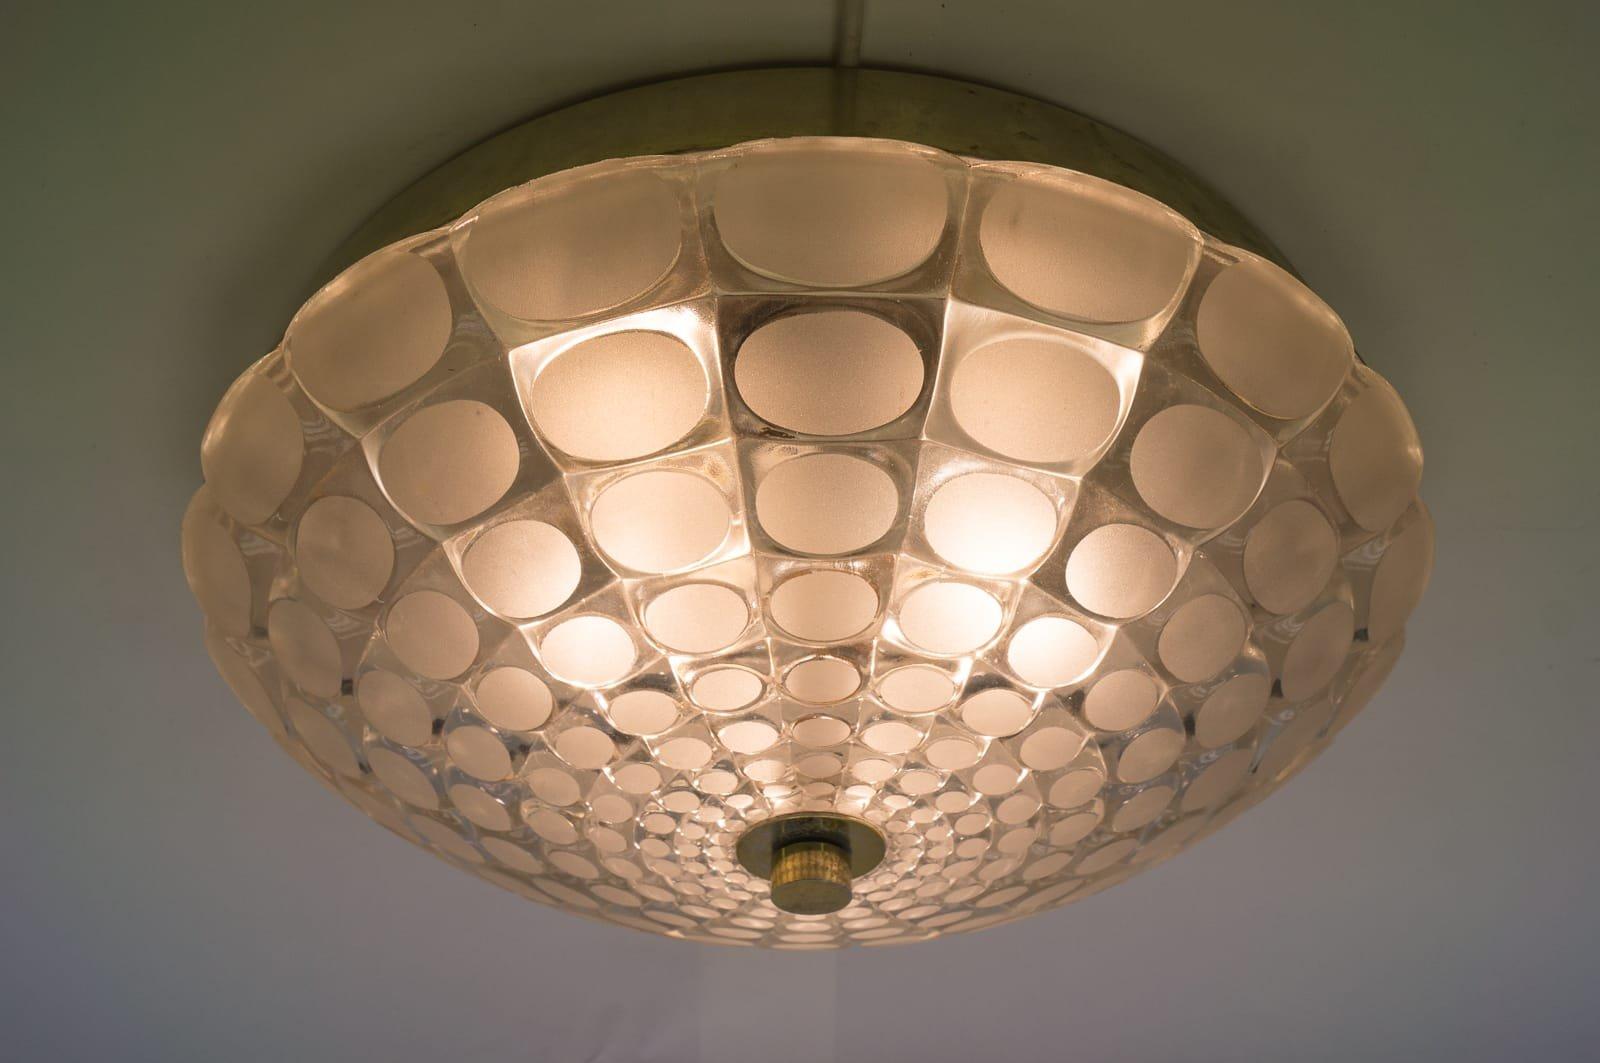 gro e geometrische lampe 1960er bei pamono kaufen. Black Bedroom Furniture Sets. Home Design Ideas